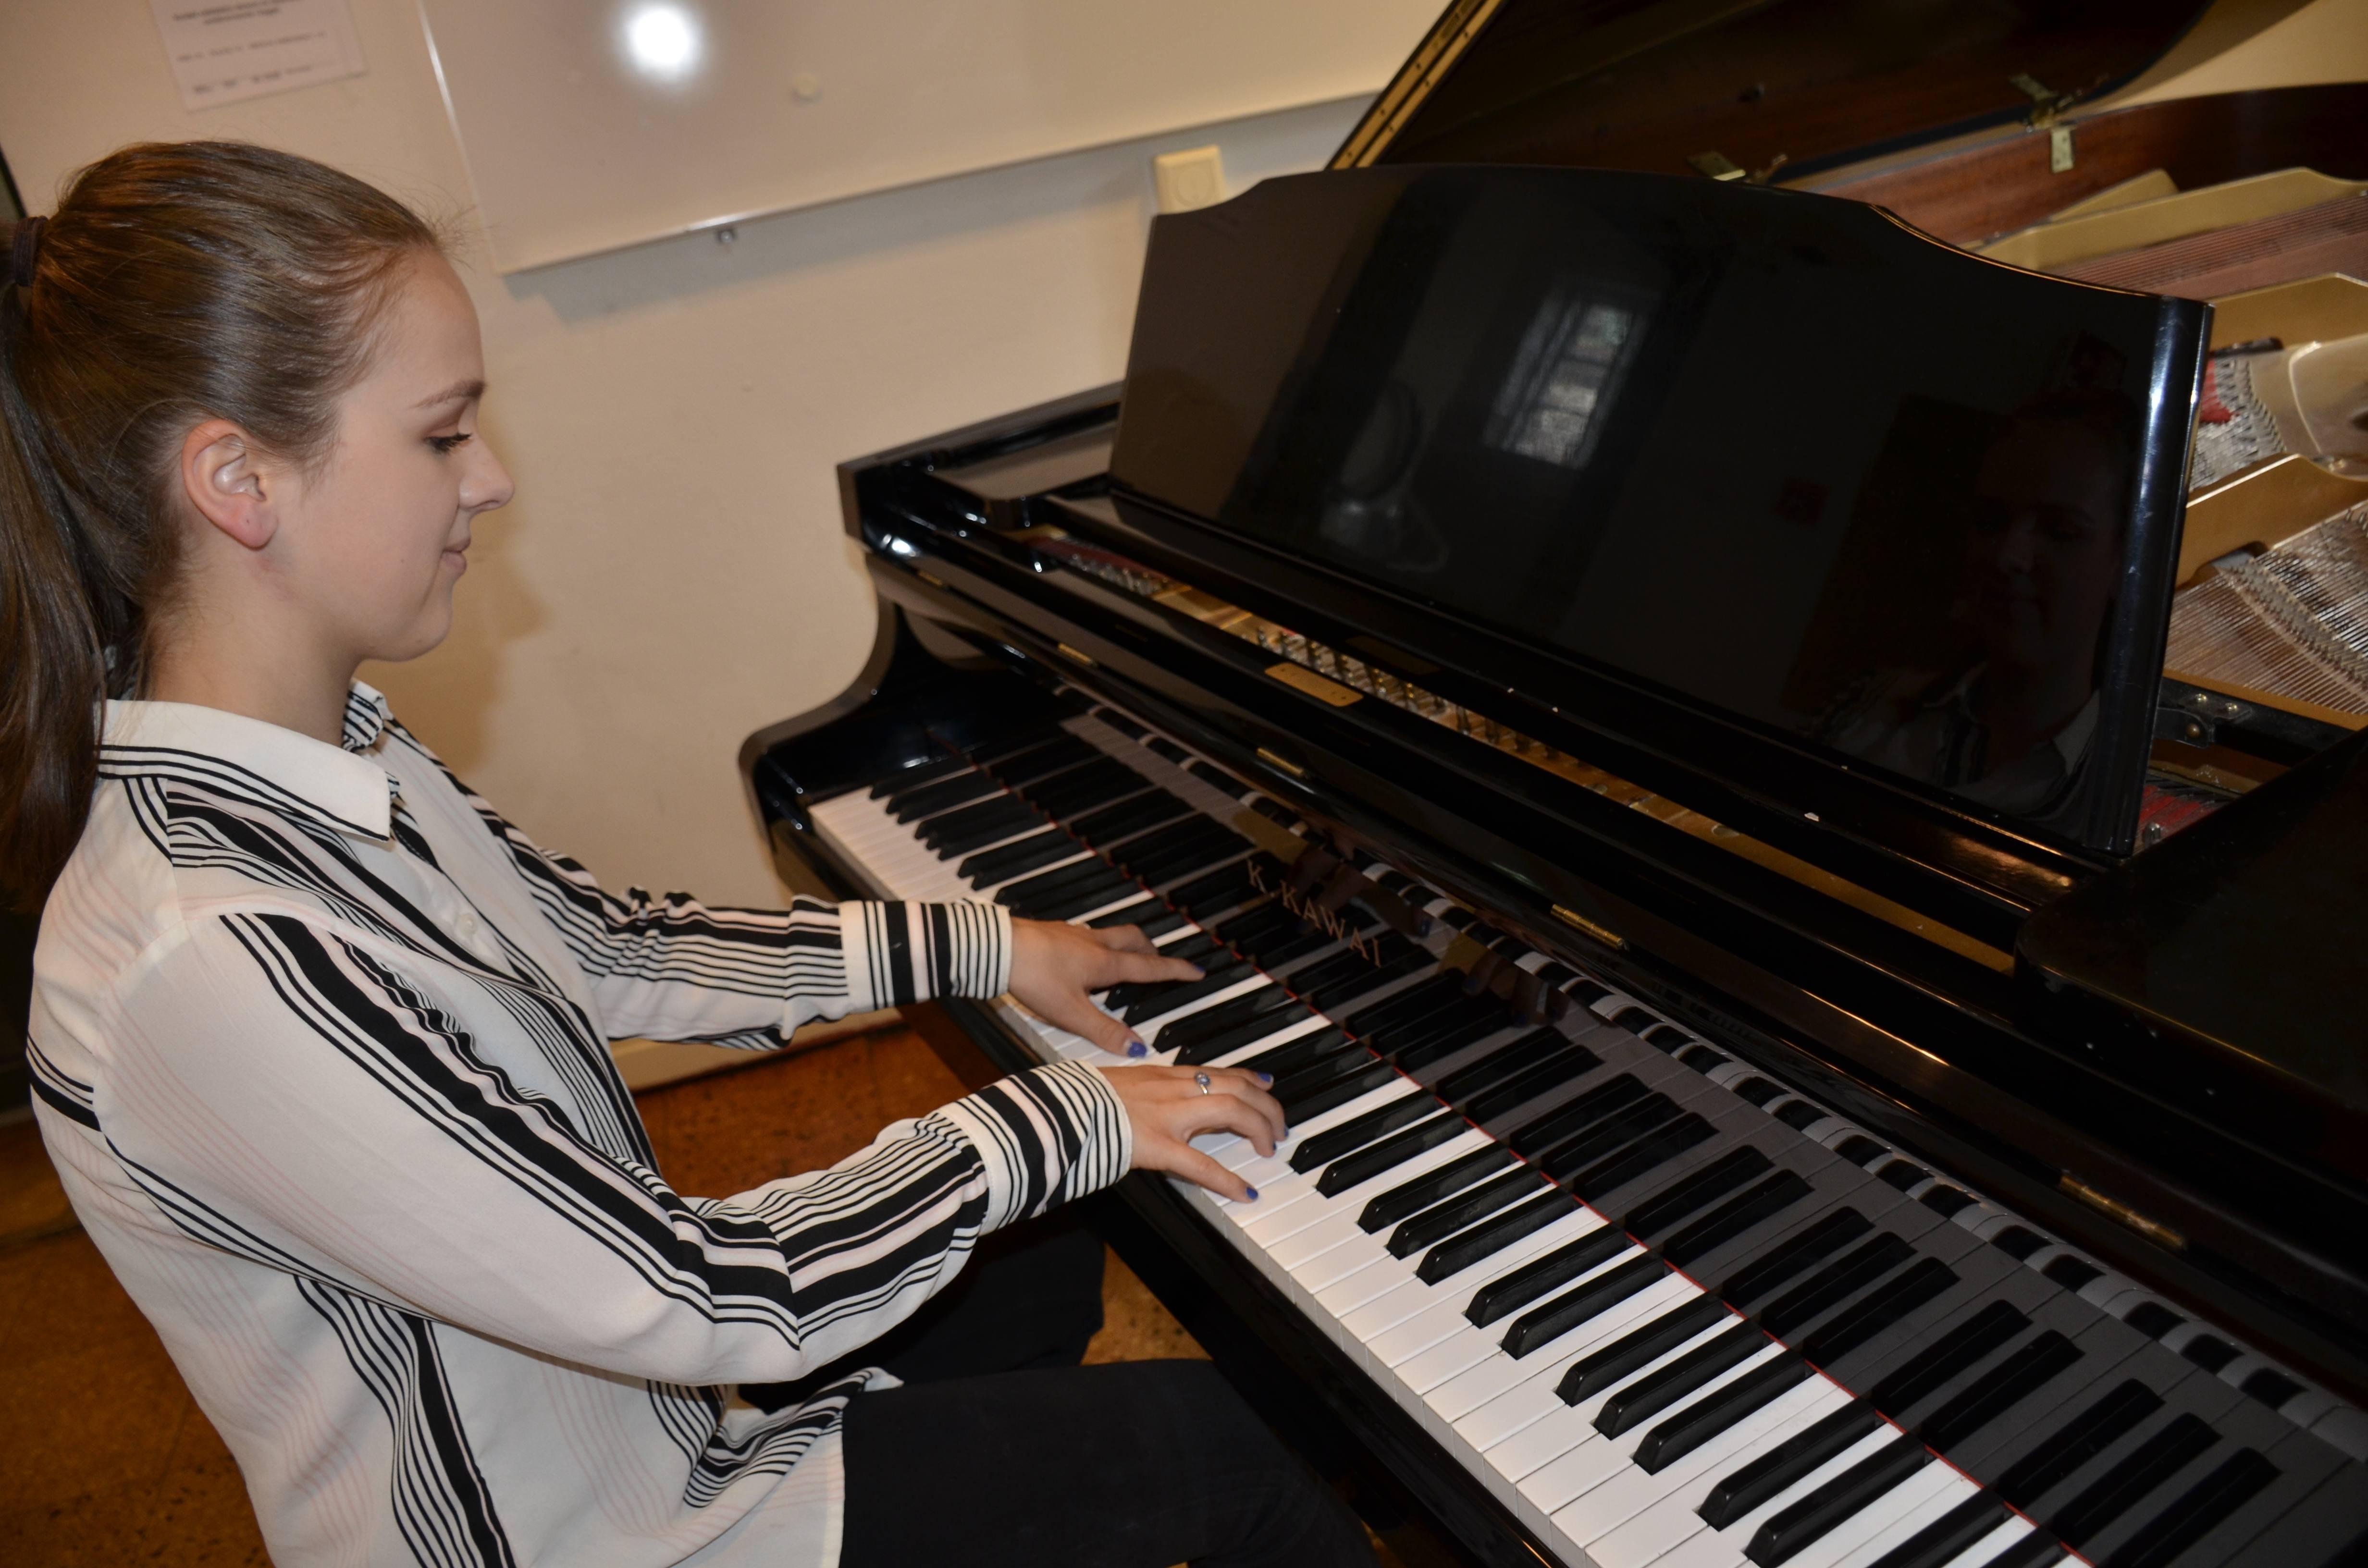 Foto: Jente som spiller piano